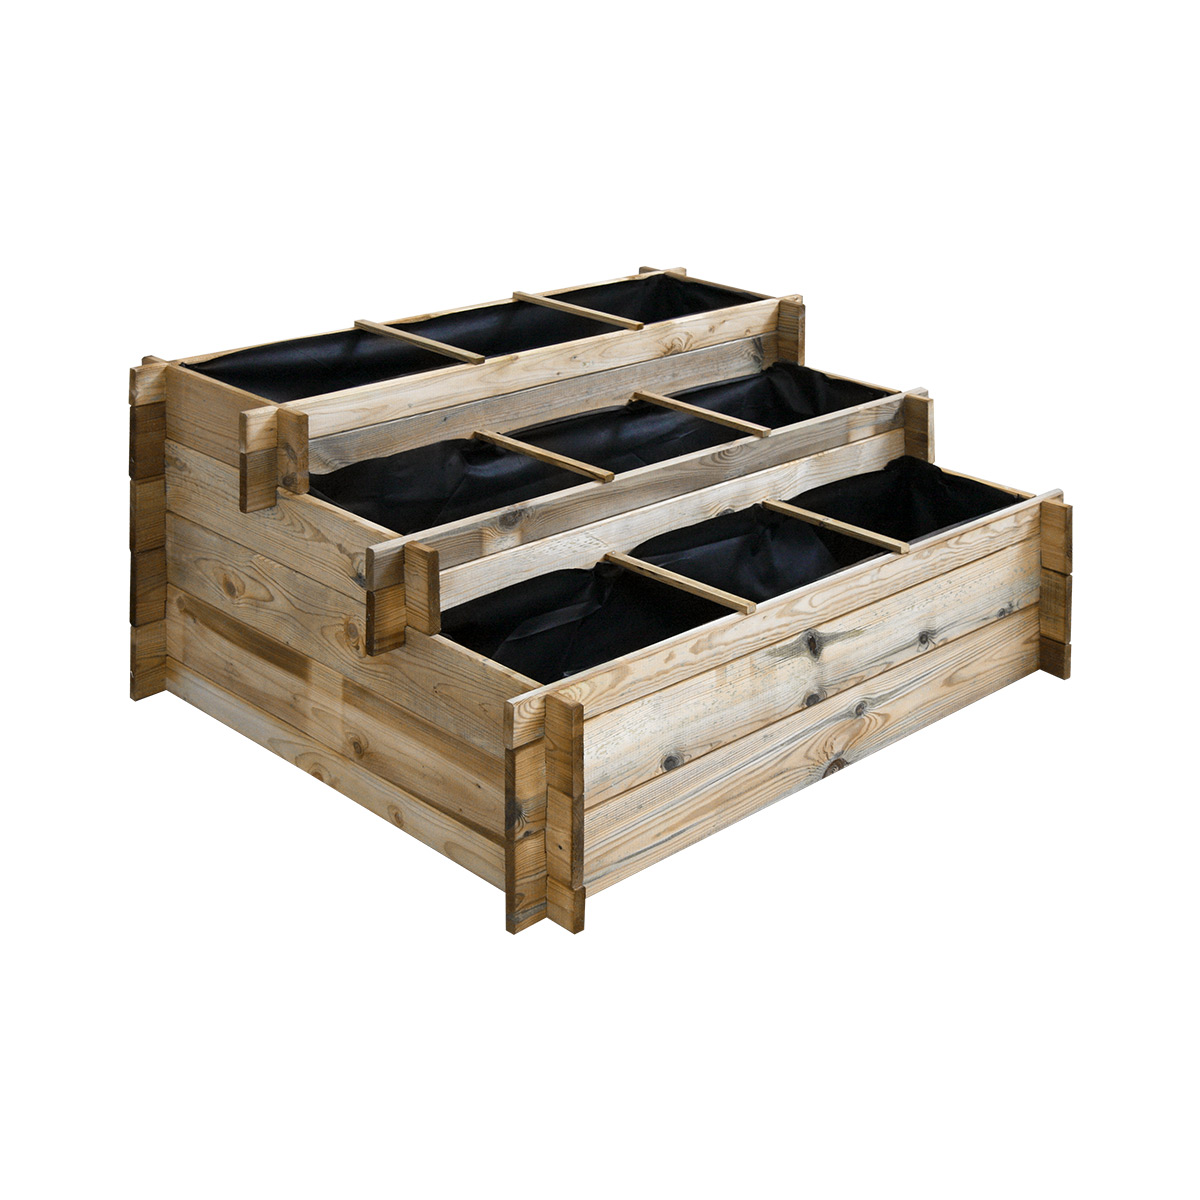 grand tages achat vente de grand pas cher. Black Bedroom Furniture Sets. Home Design Ideas